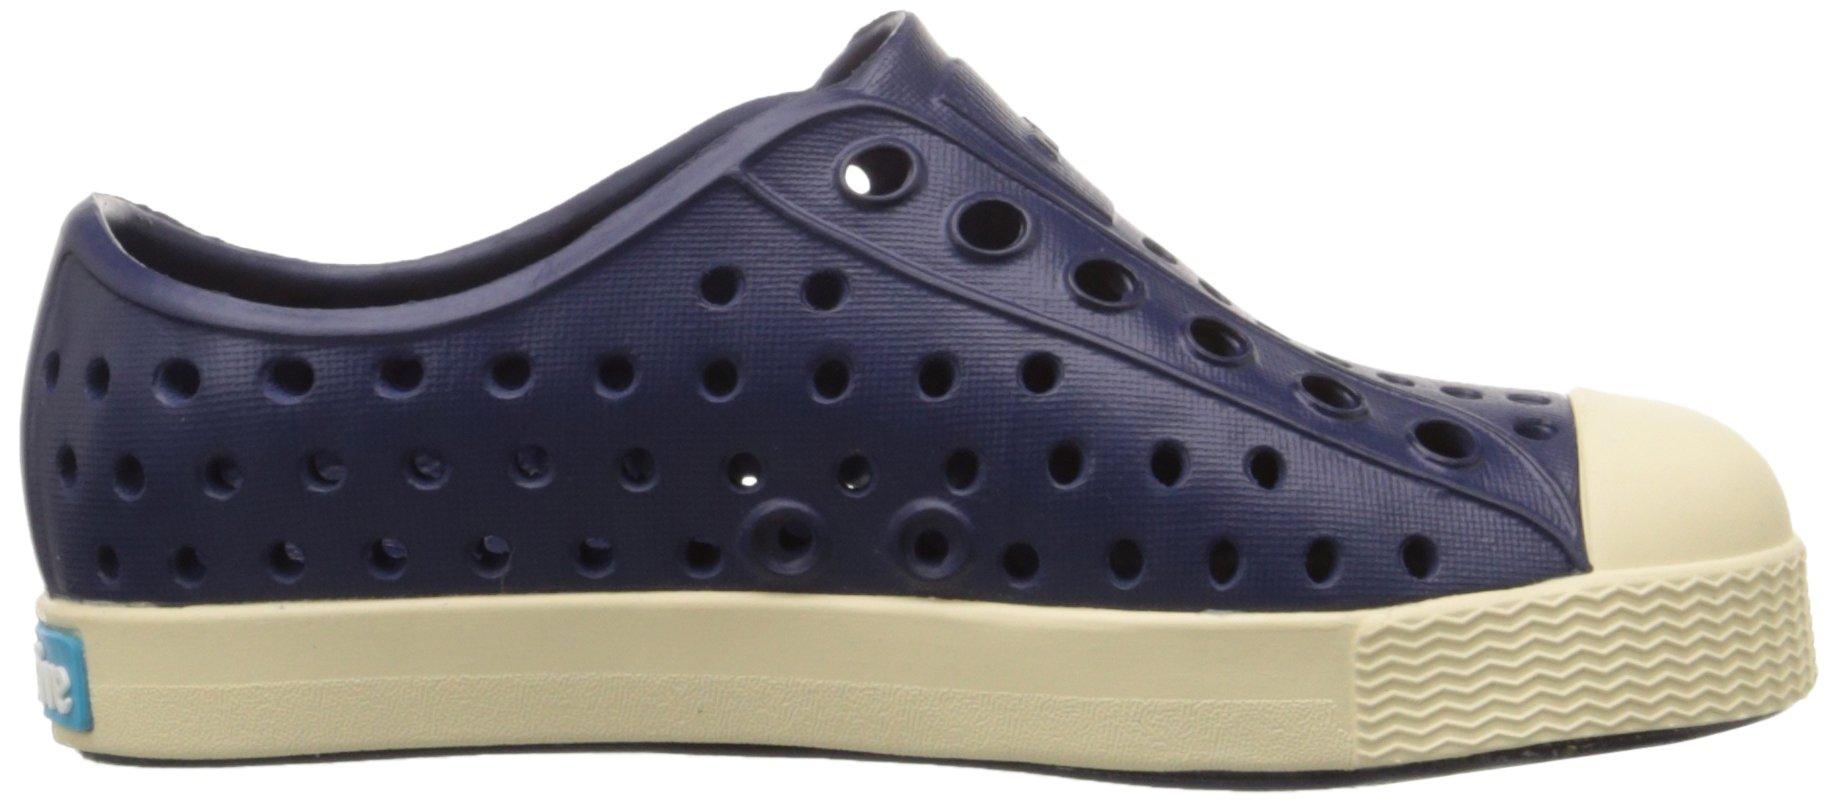 Native Jefferson Slip-On Sneaker,Regatta Blue,10 M US Toddler by Native Shoes (Image #7)